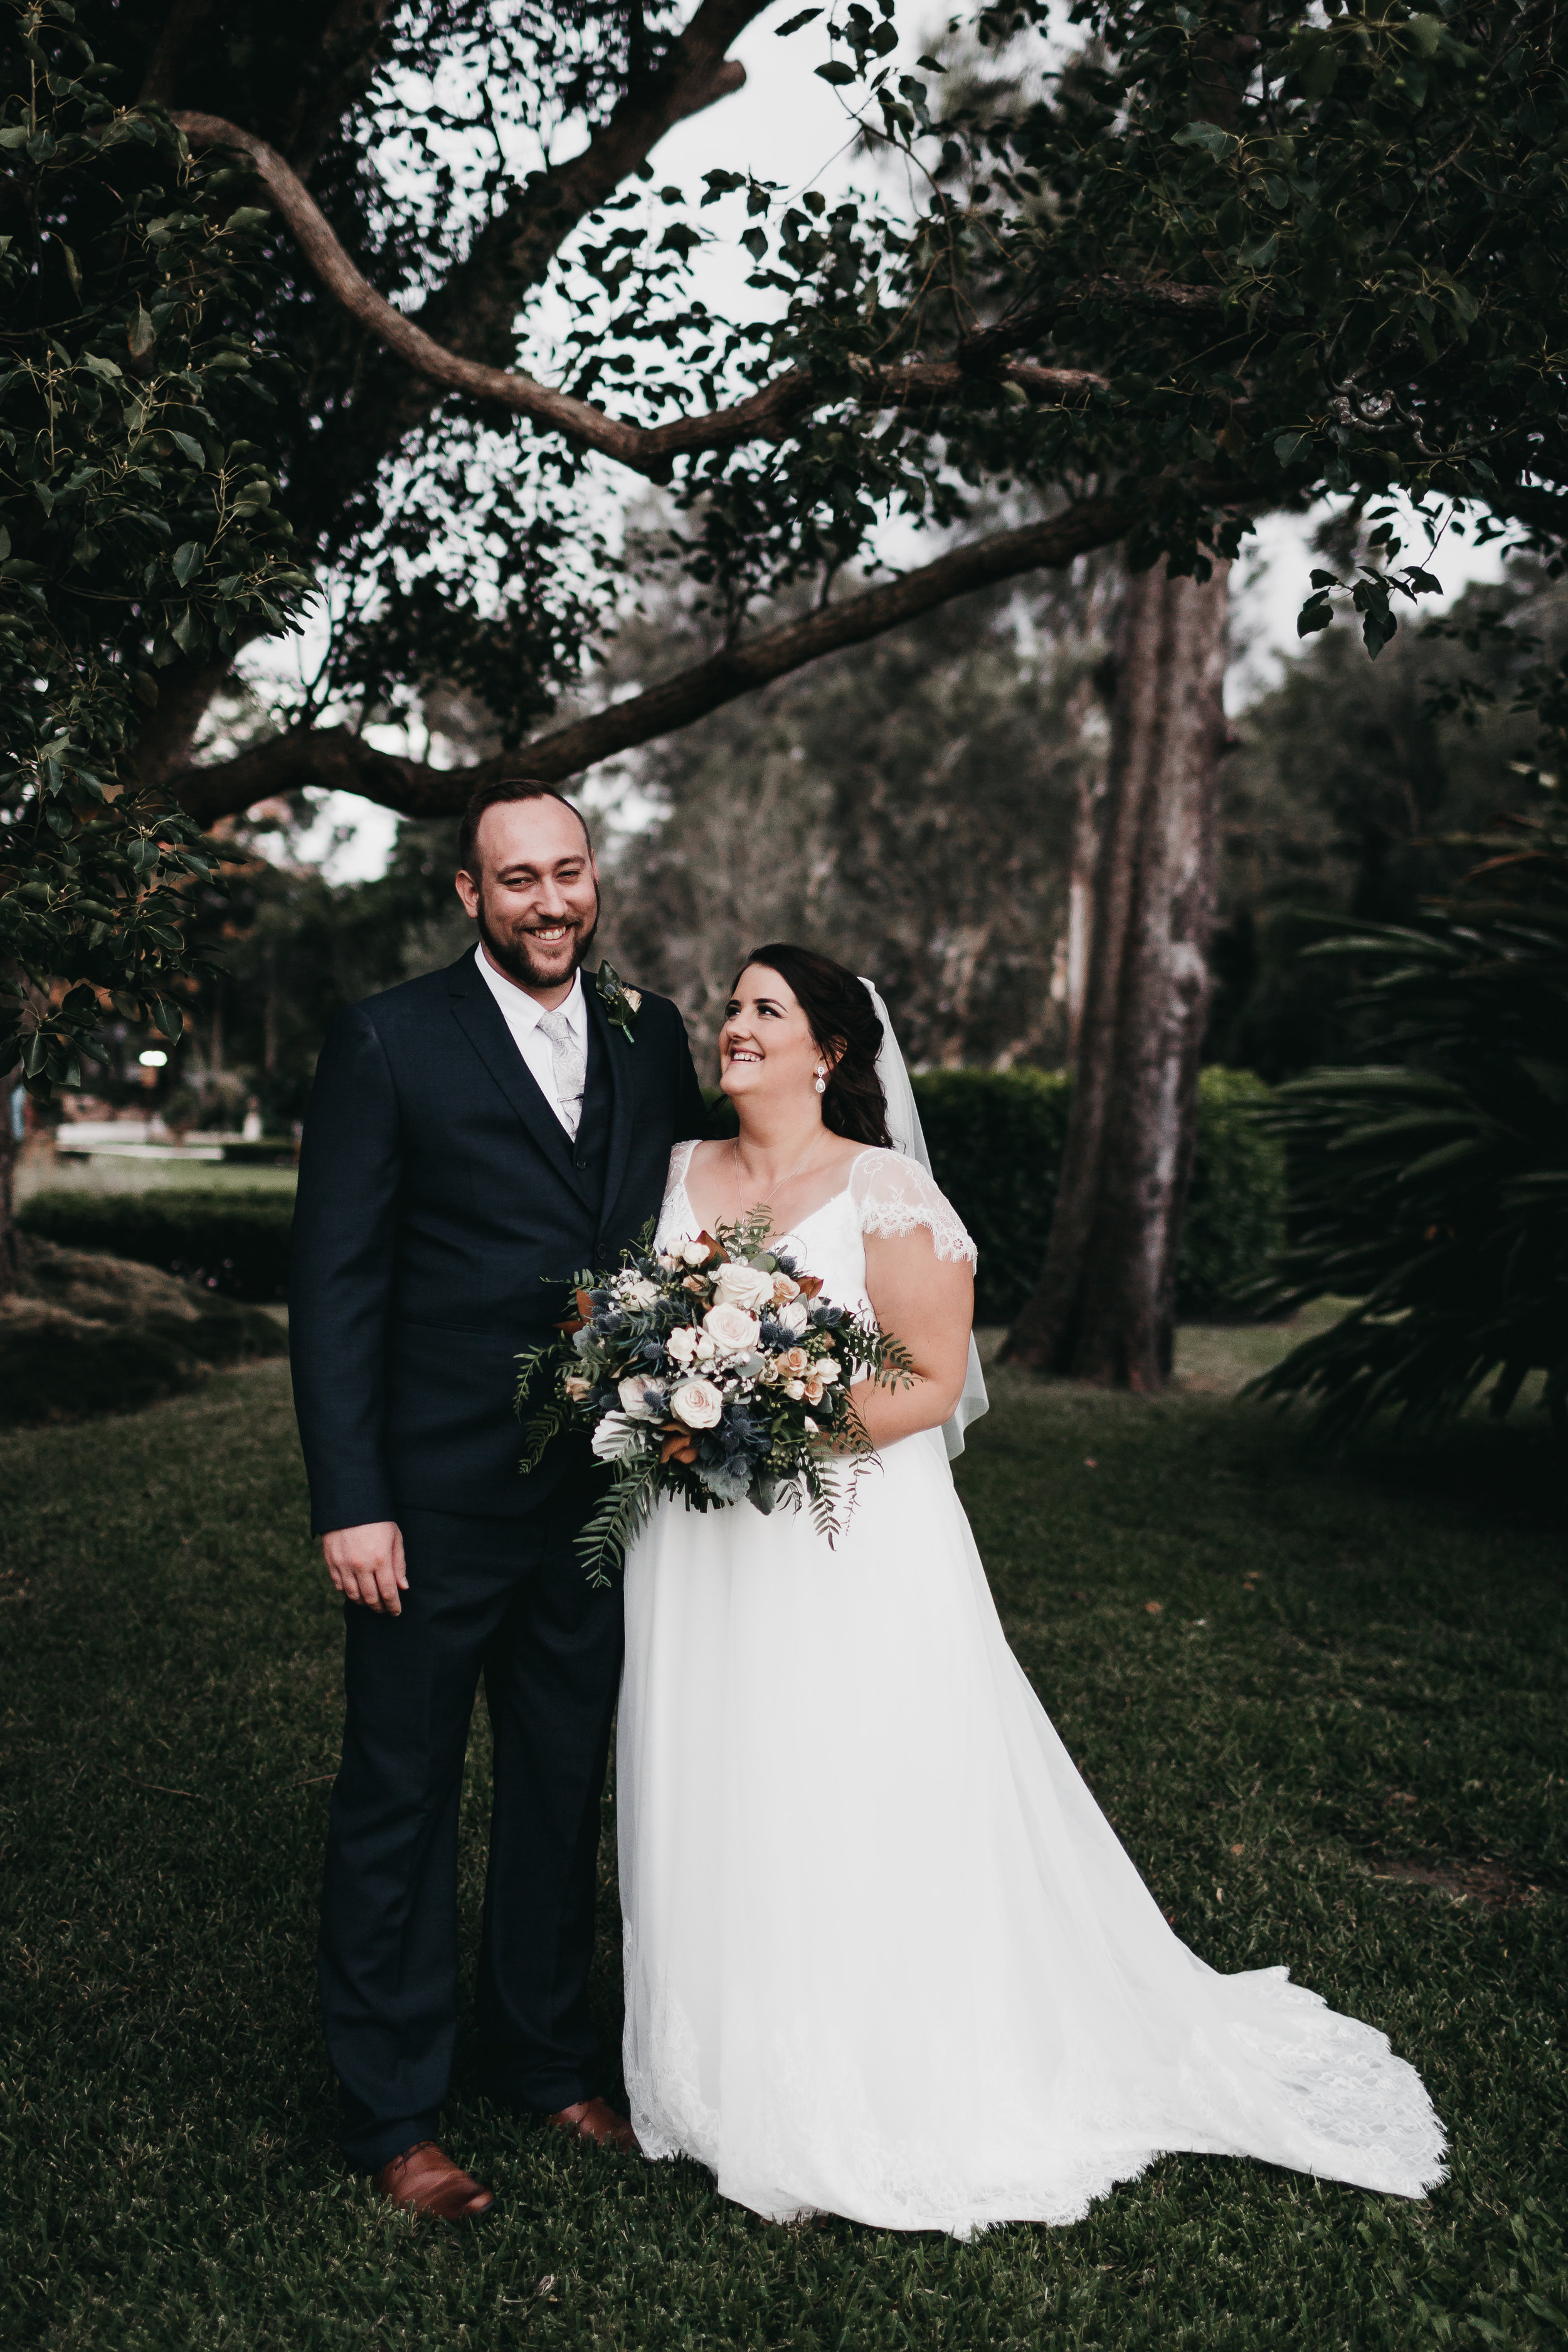 bondwedding-557.jpg